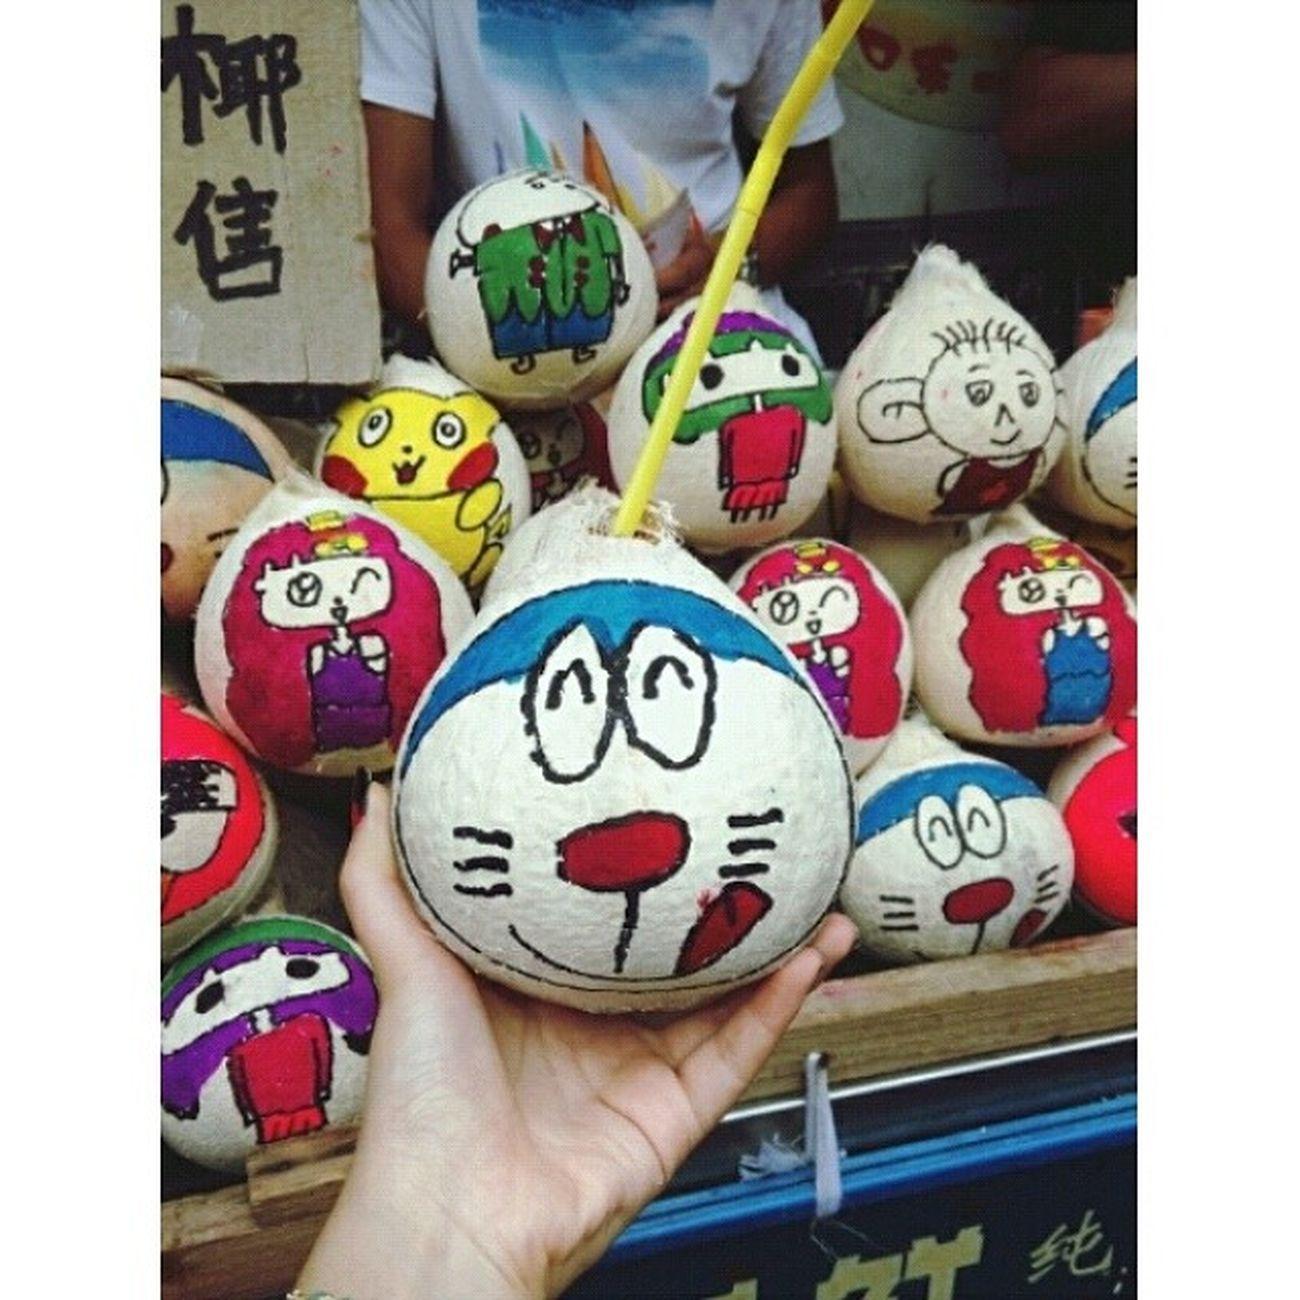 Coconut Adream 多啦A梦 Cute 多啦A梦治好了我的选择恐惧。嗯!